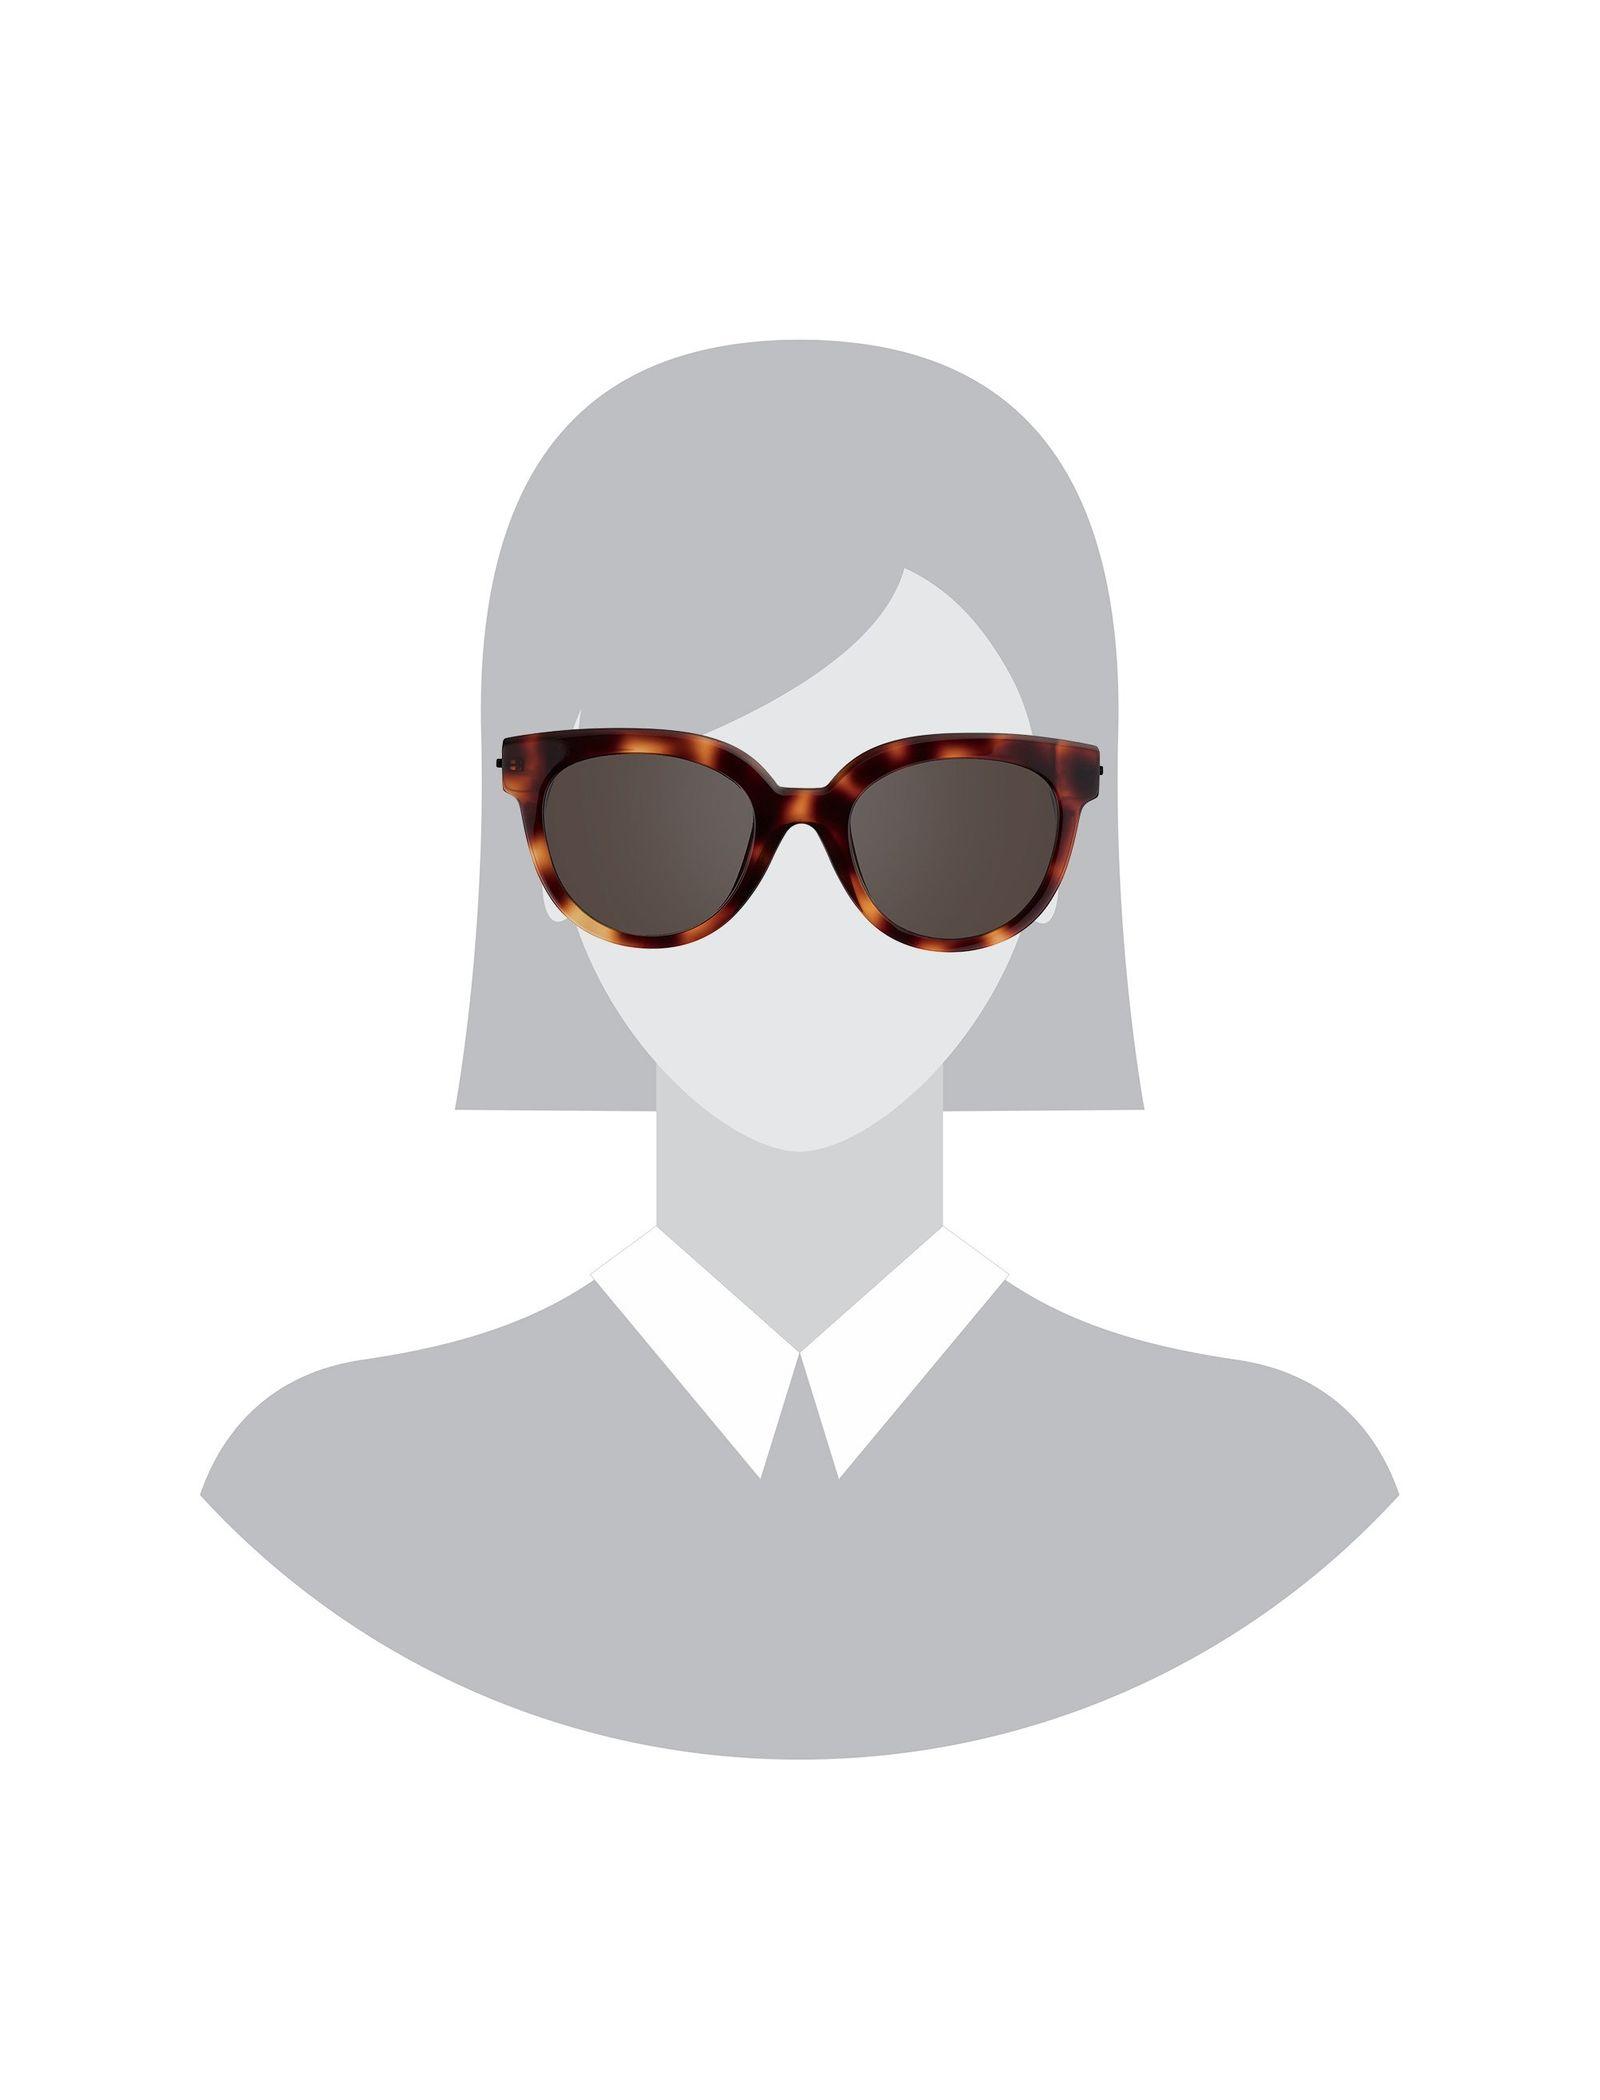 عینک آفتابی پنتوس زنانه - ساندرو - قهوه اي  - 4